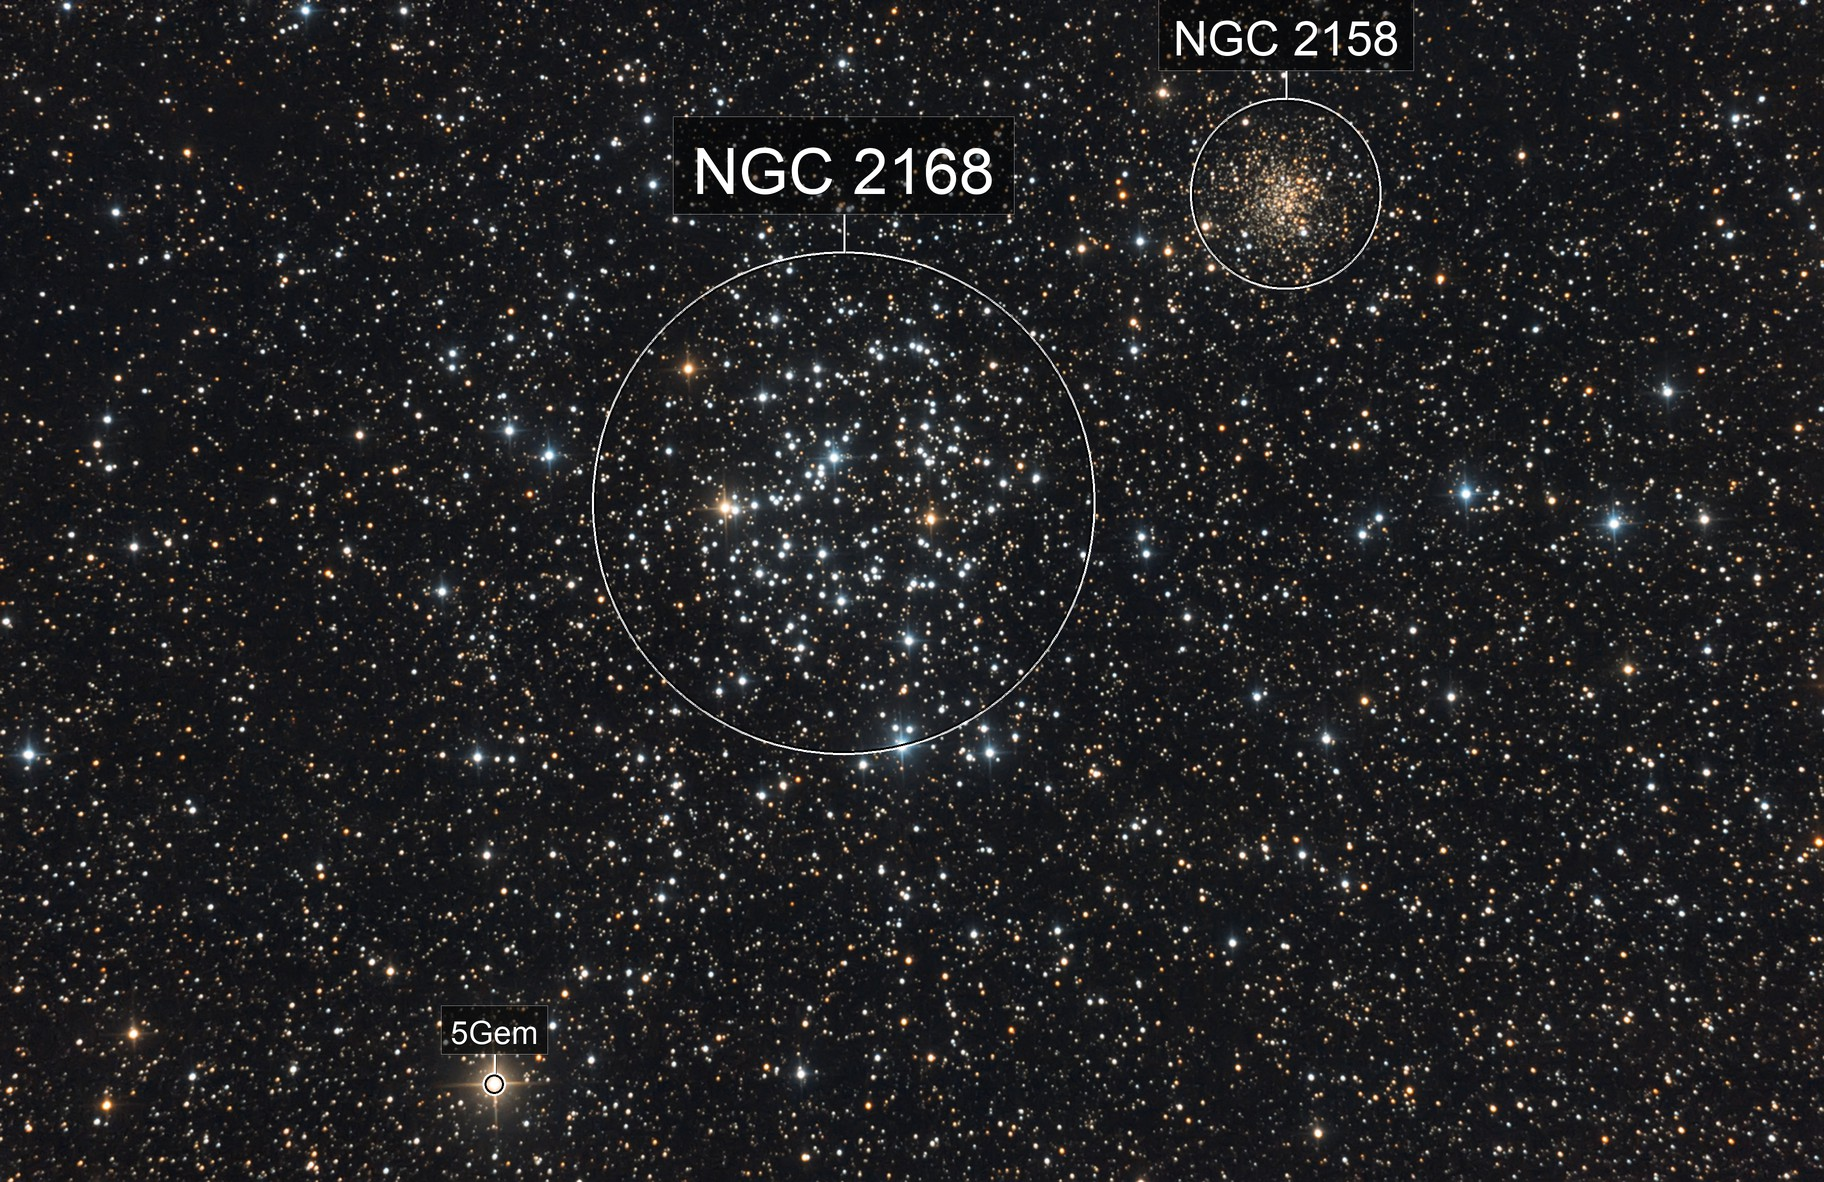 Messier 35 and NGC 2158